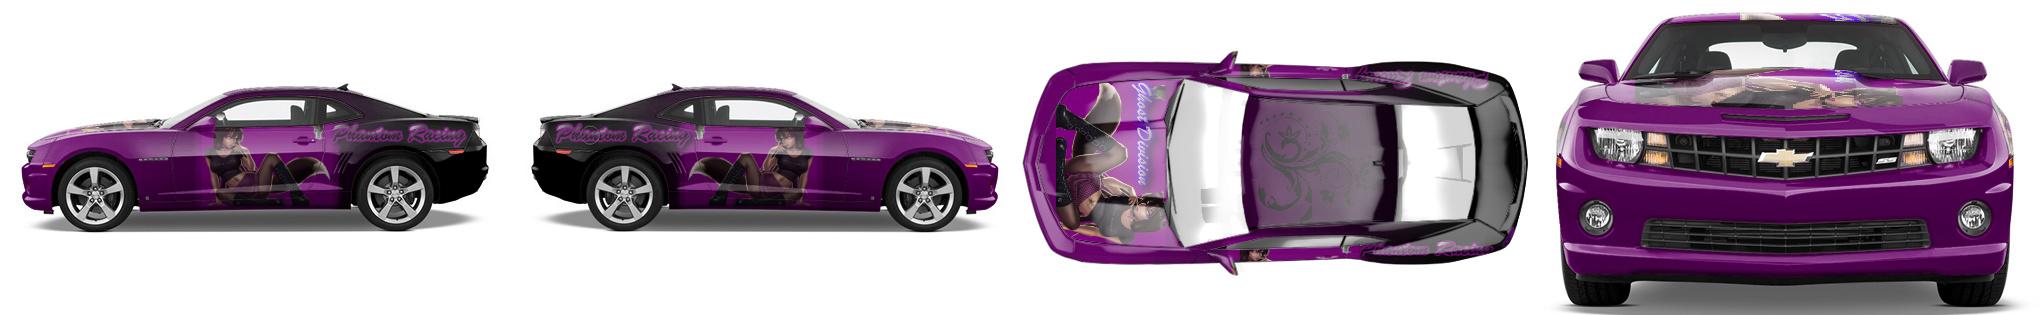 Muscle Car Wrap #14434